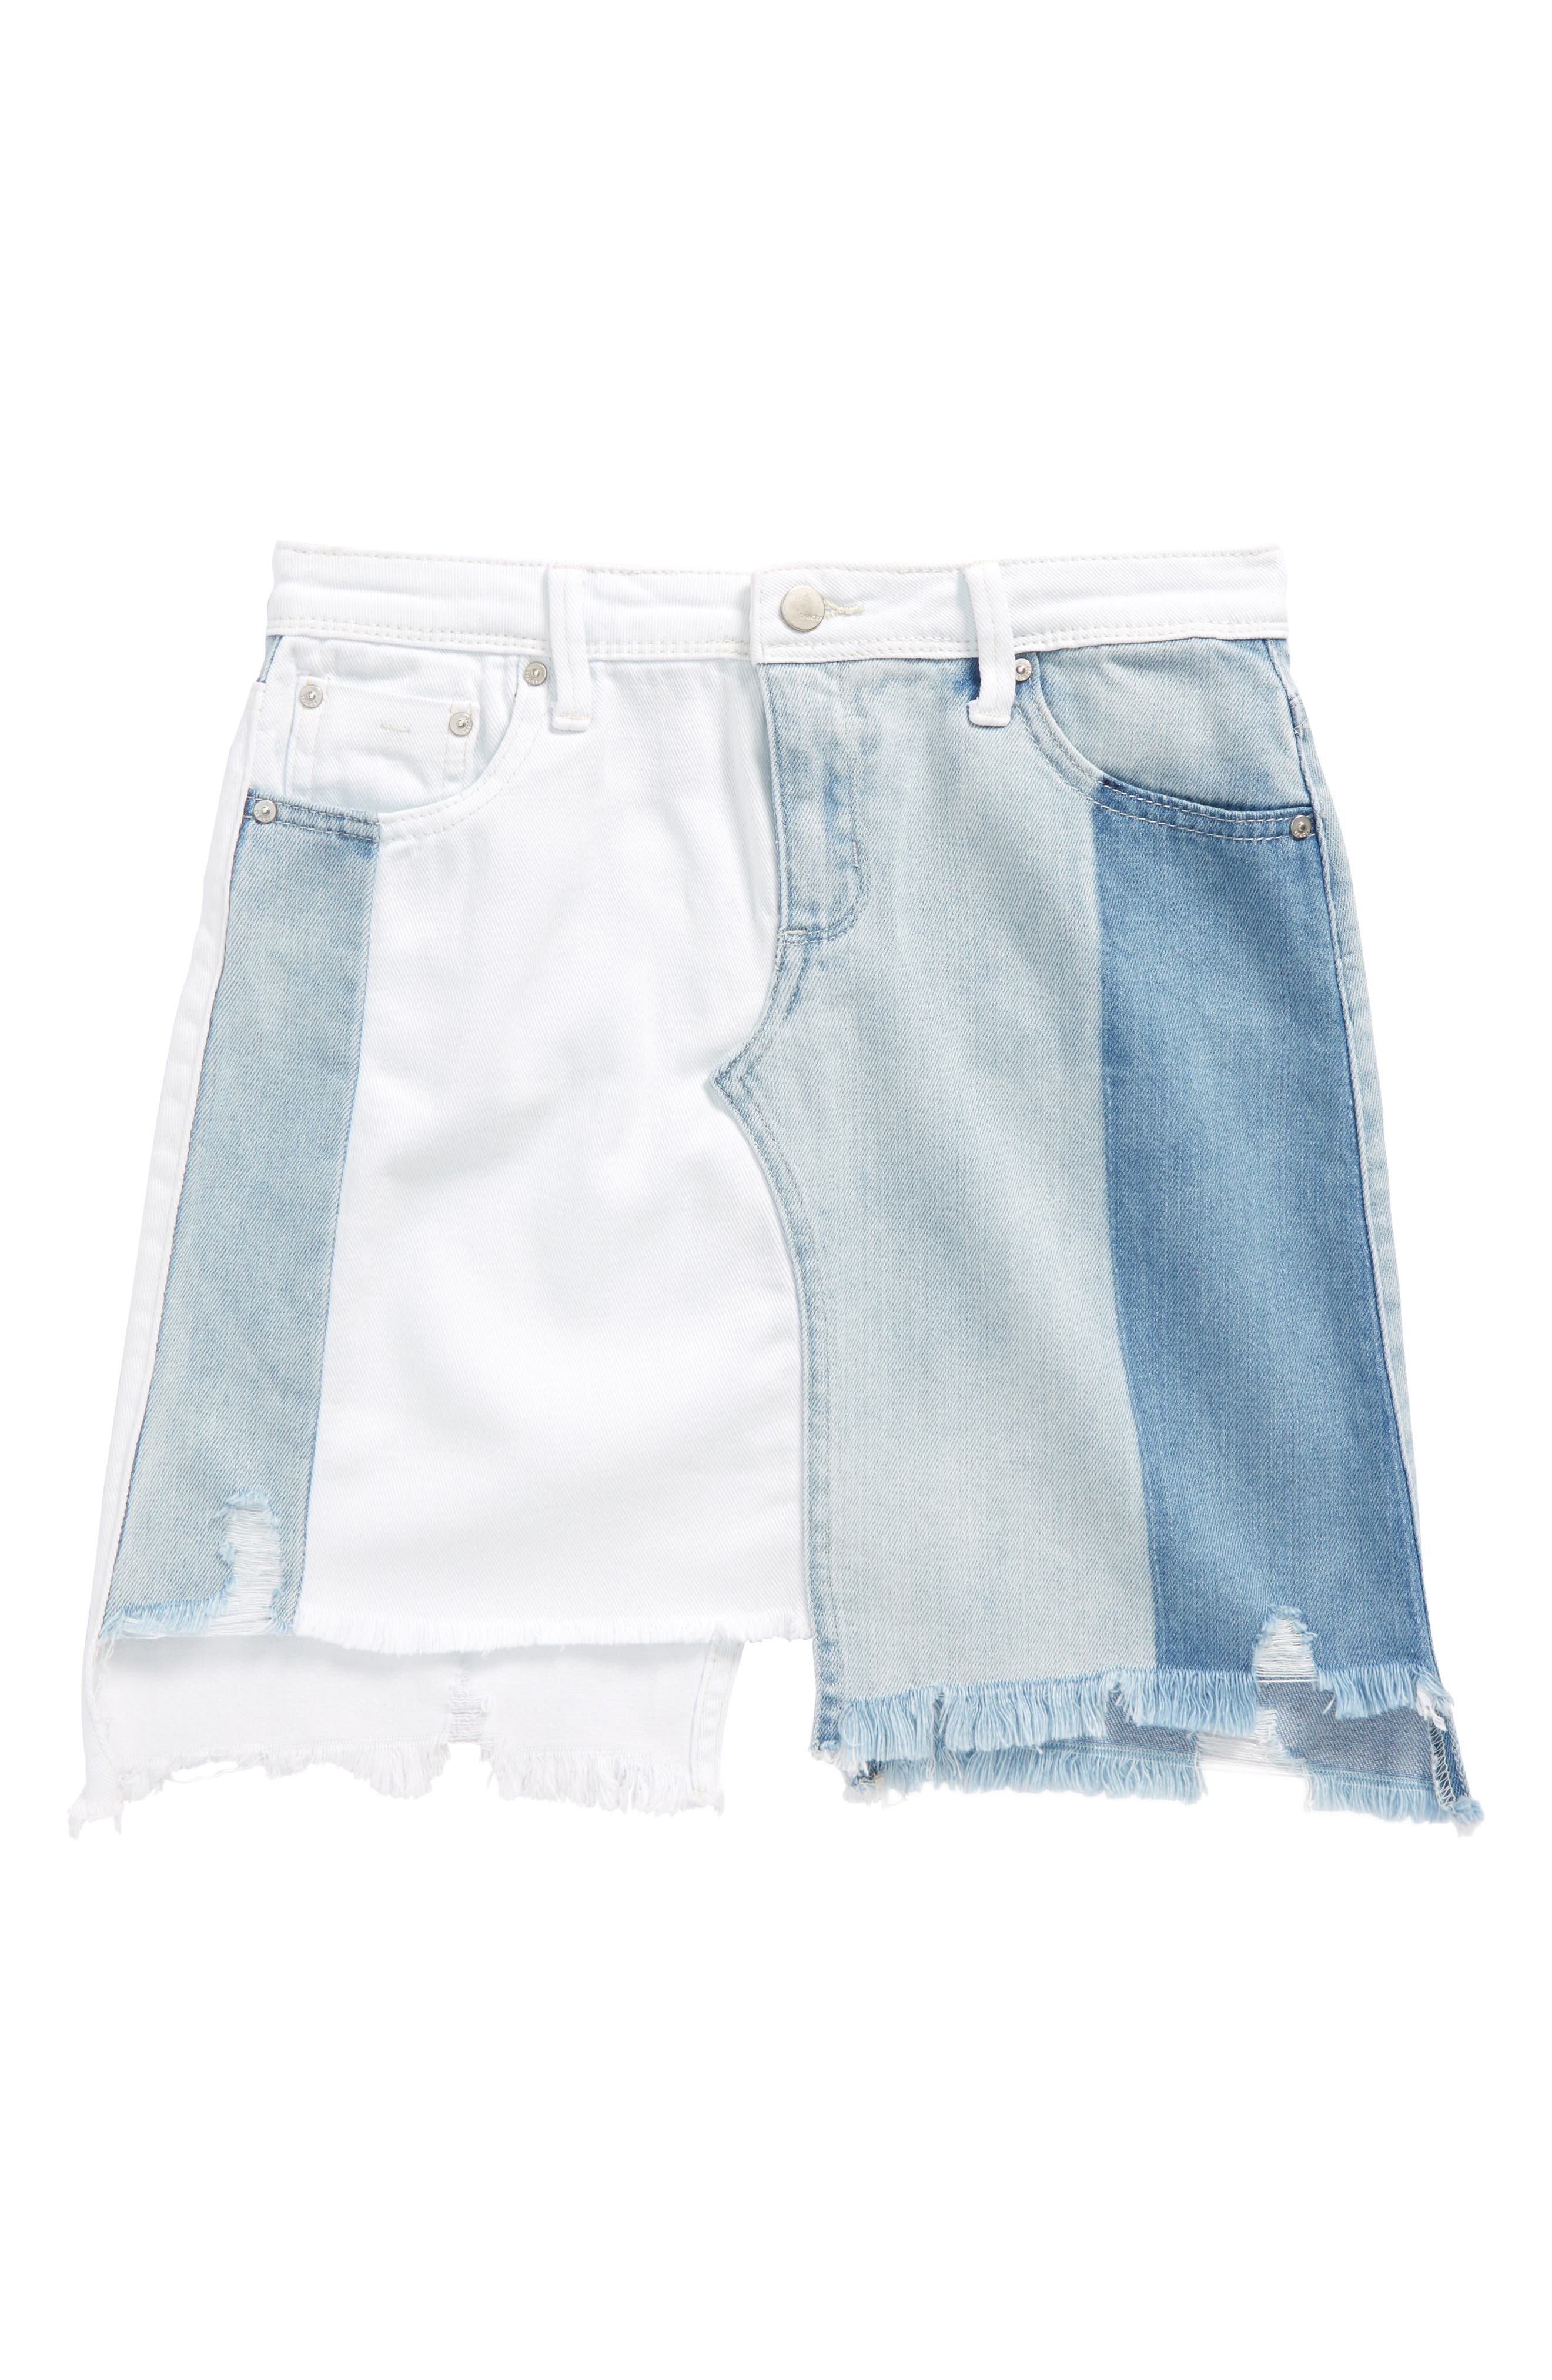 Patchwork Denim Skirt,                             Main thumbnail 1, color,                             100